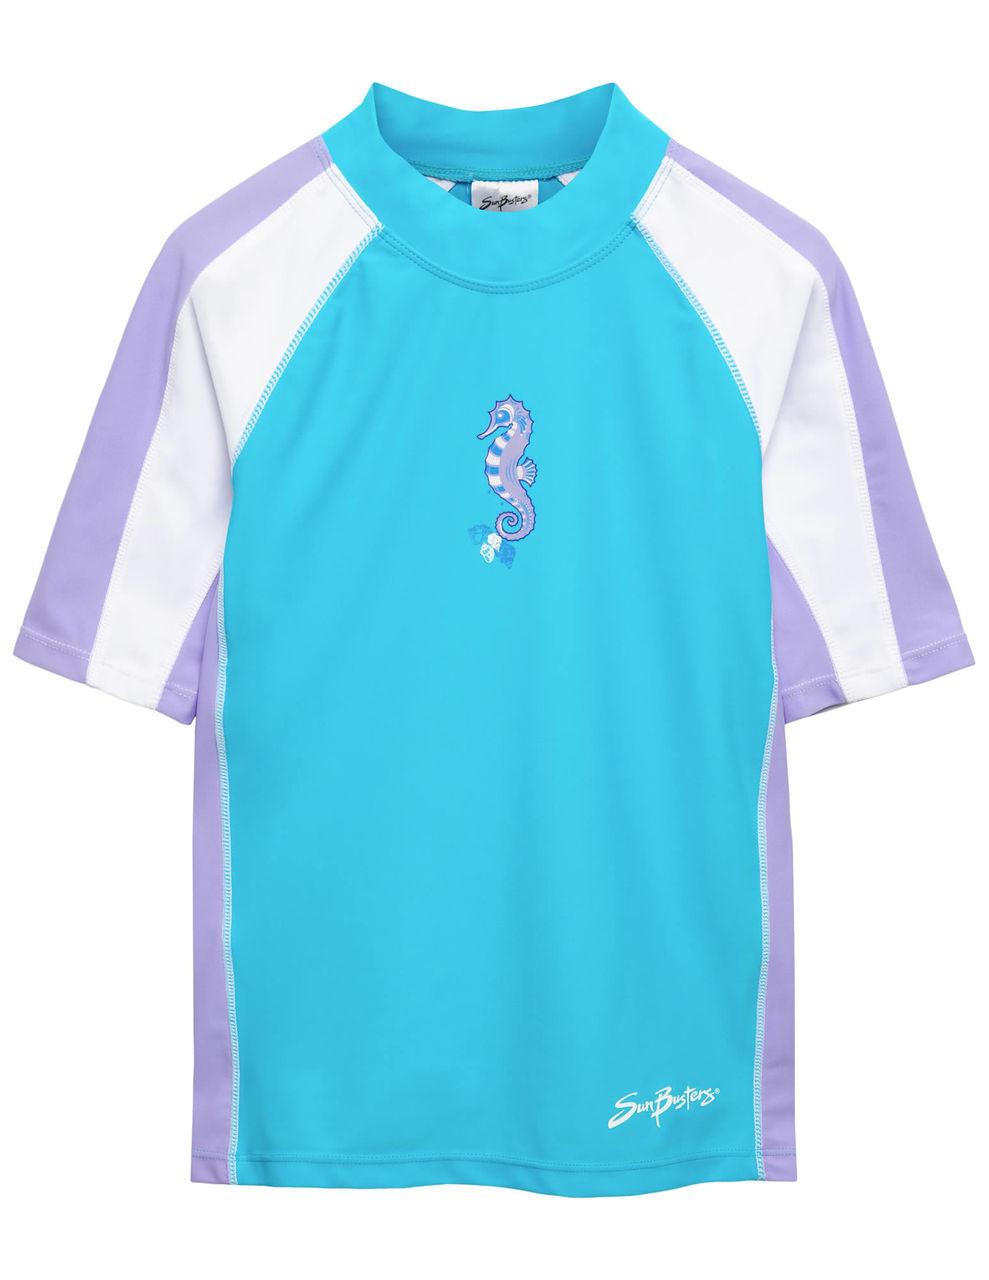 018faa0f55074 Girls Sun Busters S/S Rashguard Swim Shirt Maui Blue | Girls UV Clothing